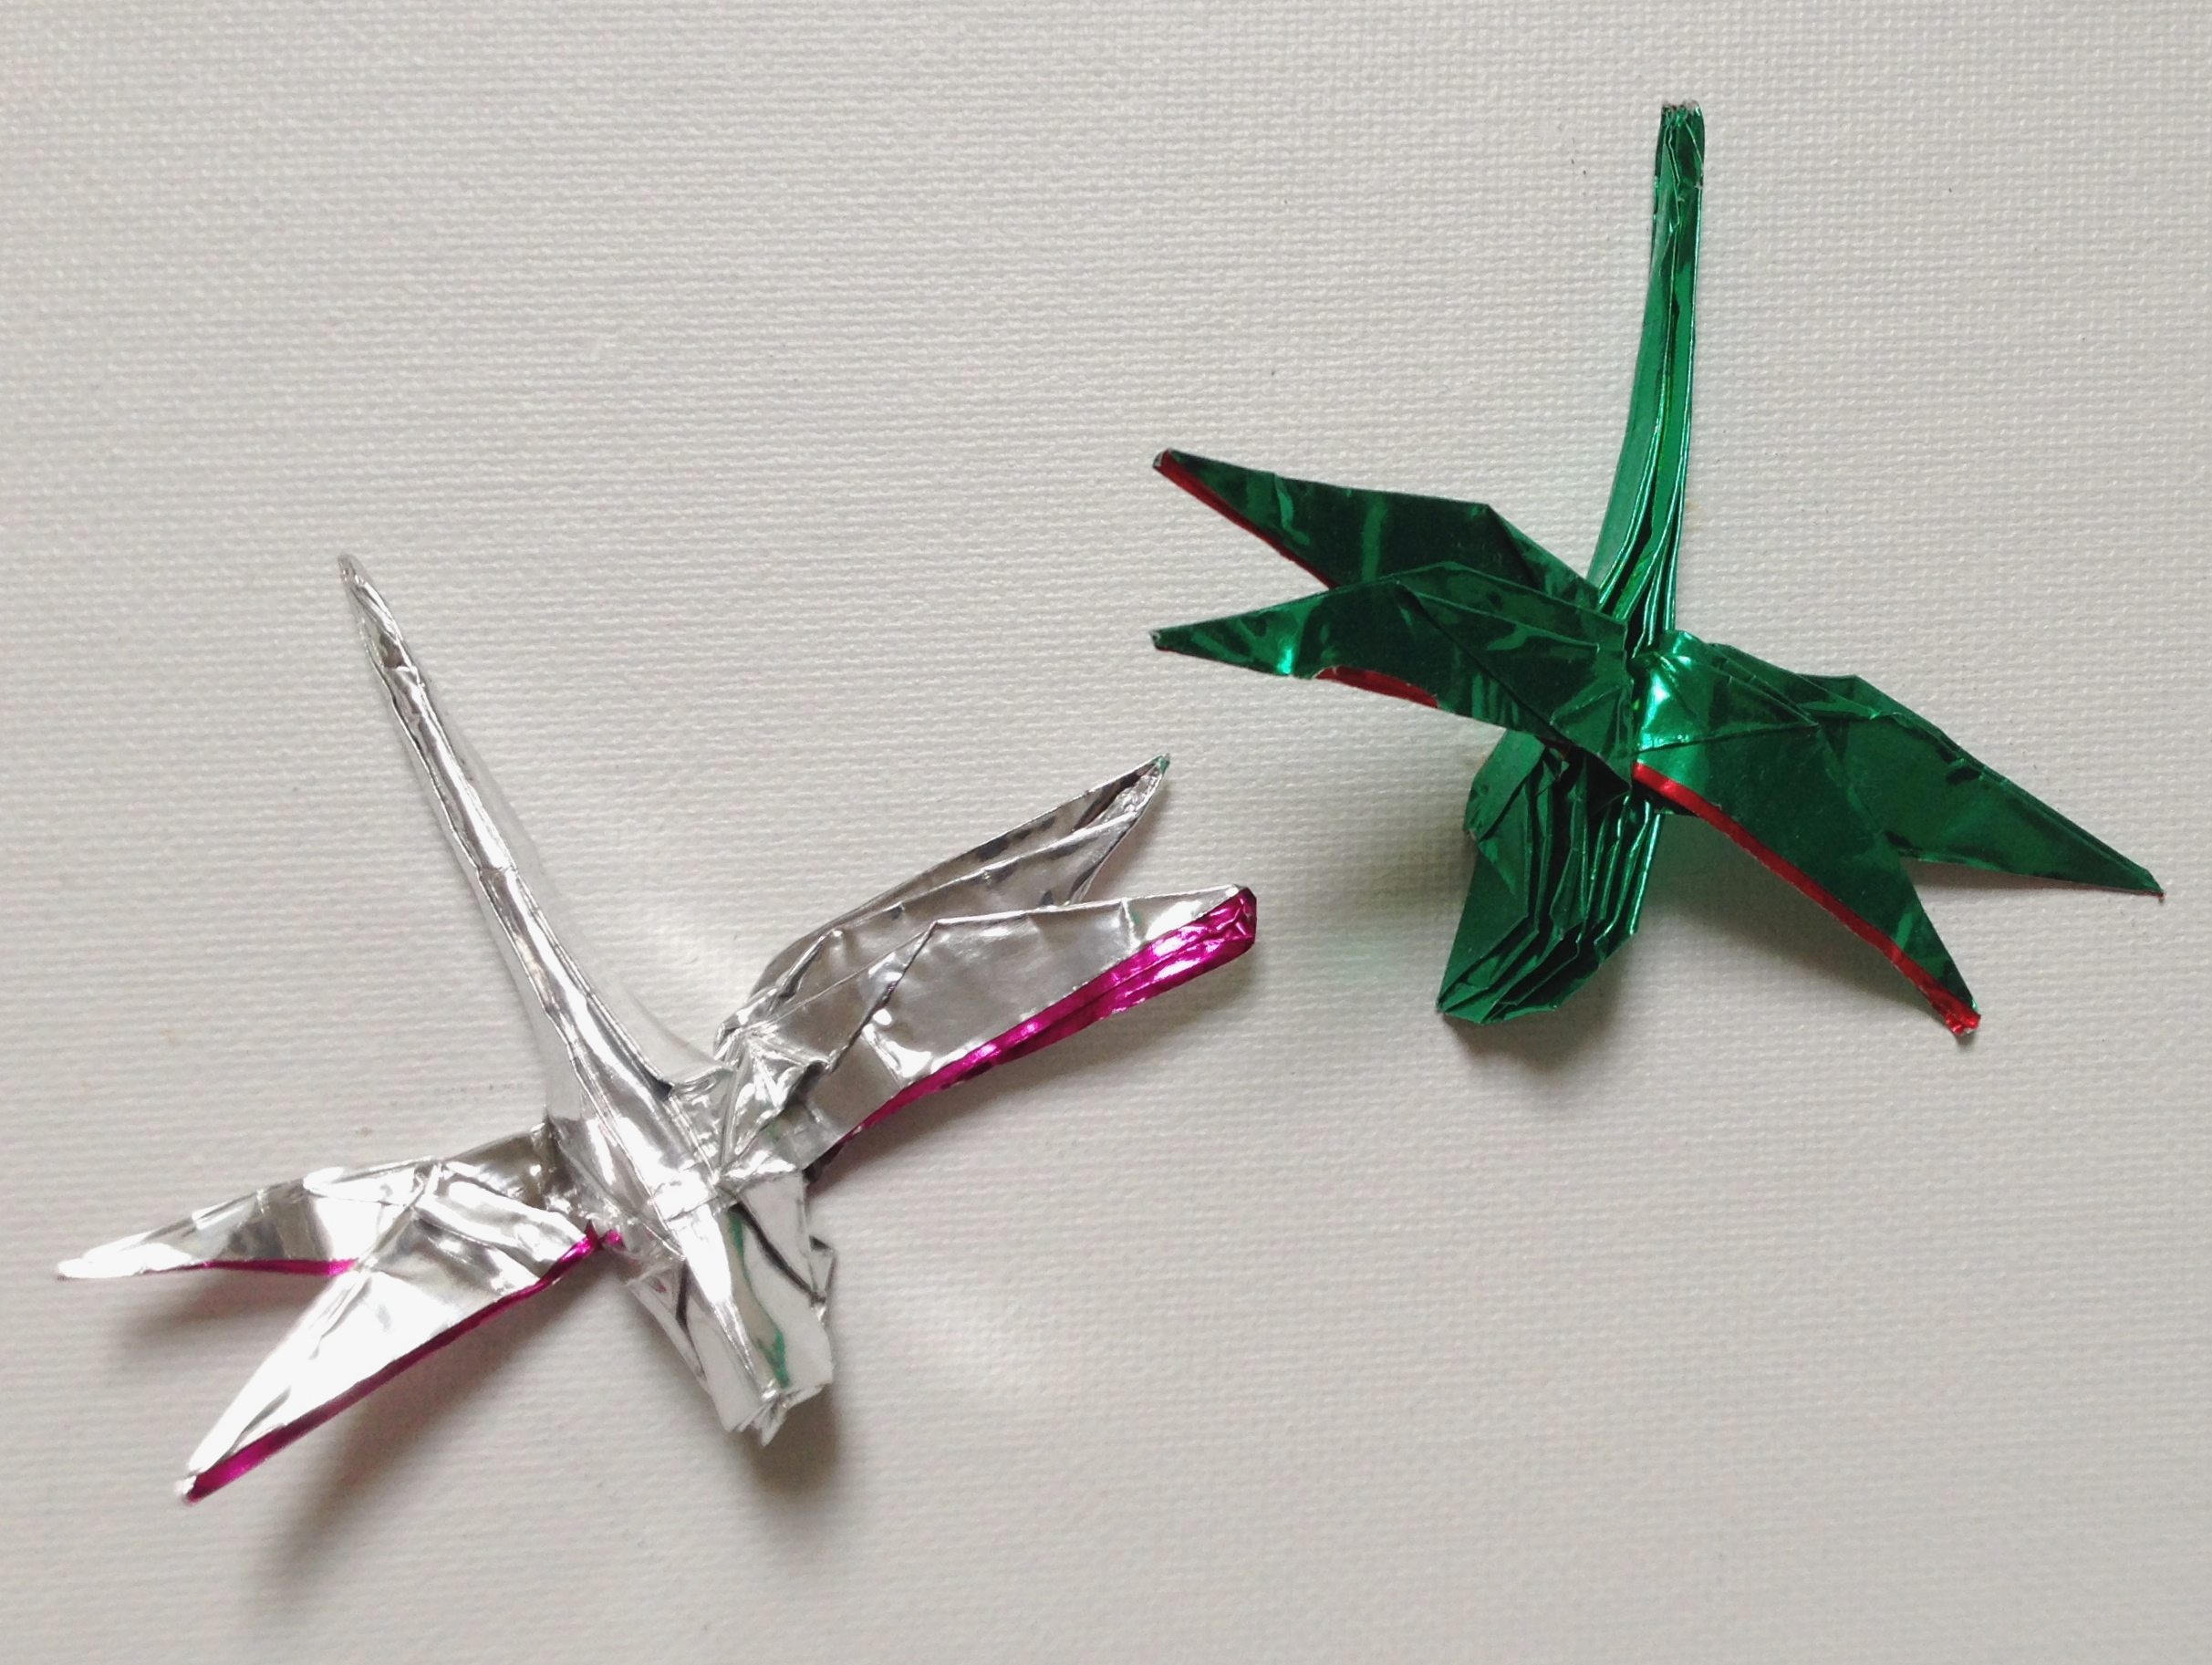 Origami zeplora design toshikazu kawasaki dragonflies design own jeuxipadfo Image collections